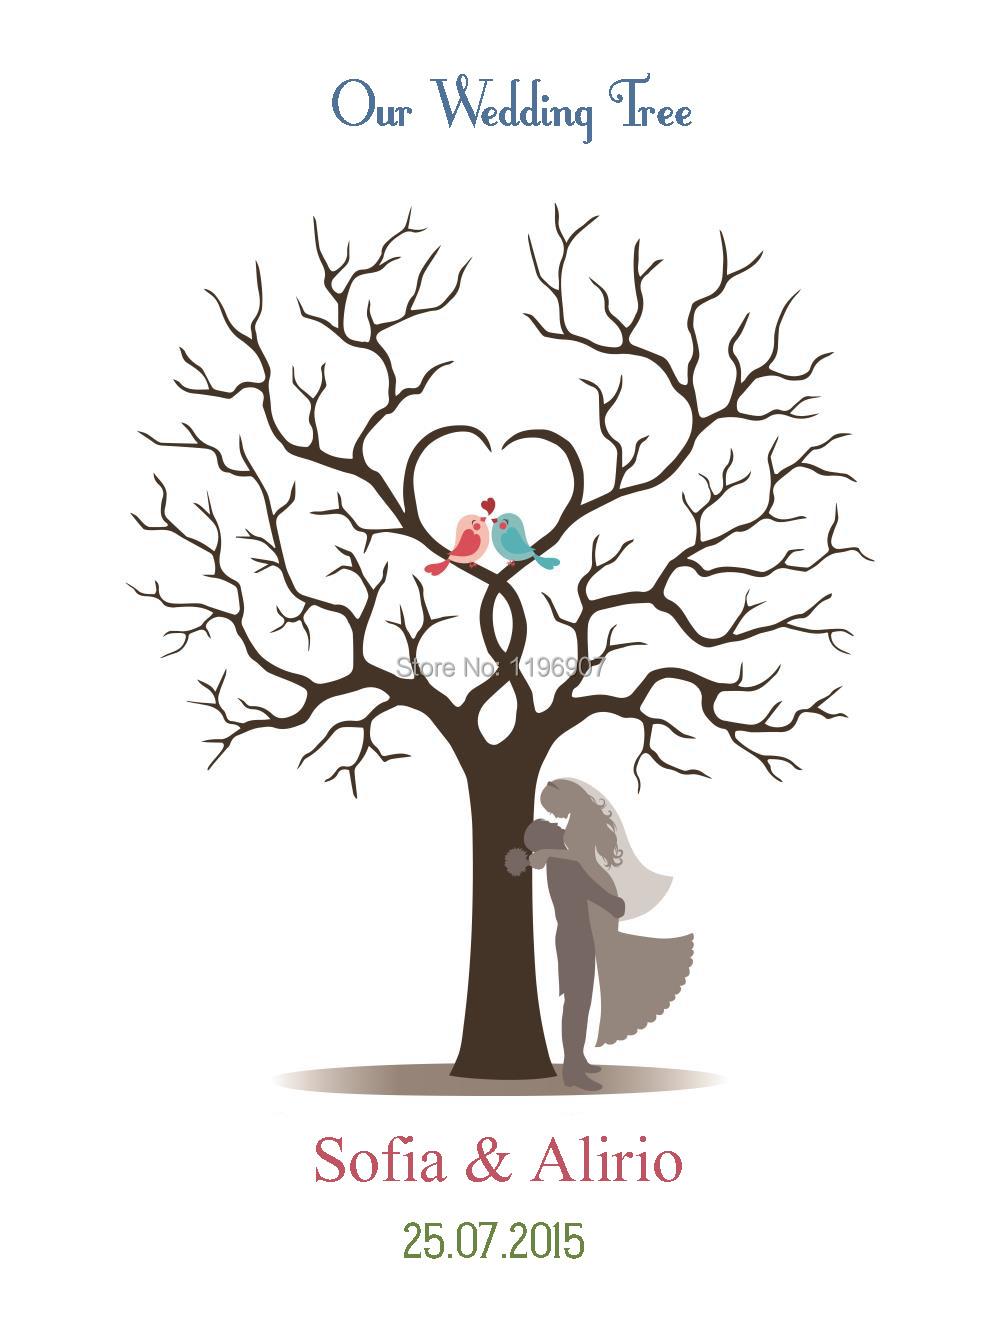 casamento wedding fingerprint tree guest book love brids. Black Bedroom Furniture Sets. Home Design Ideas